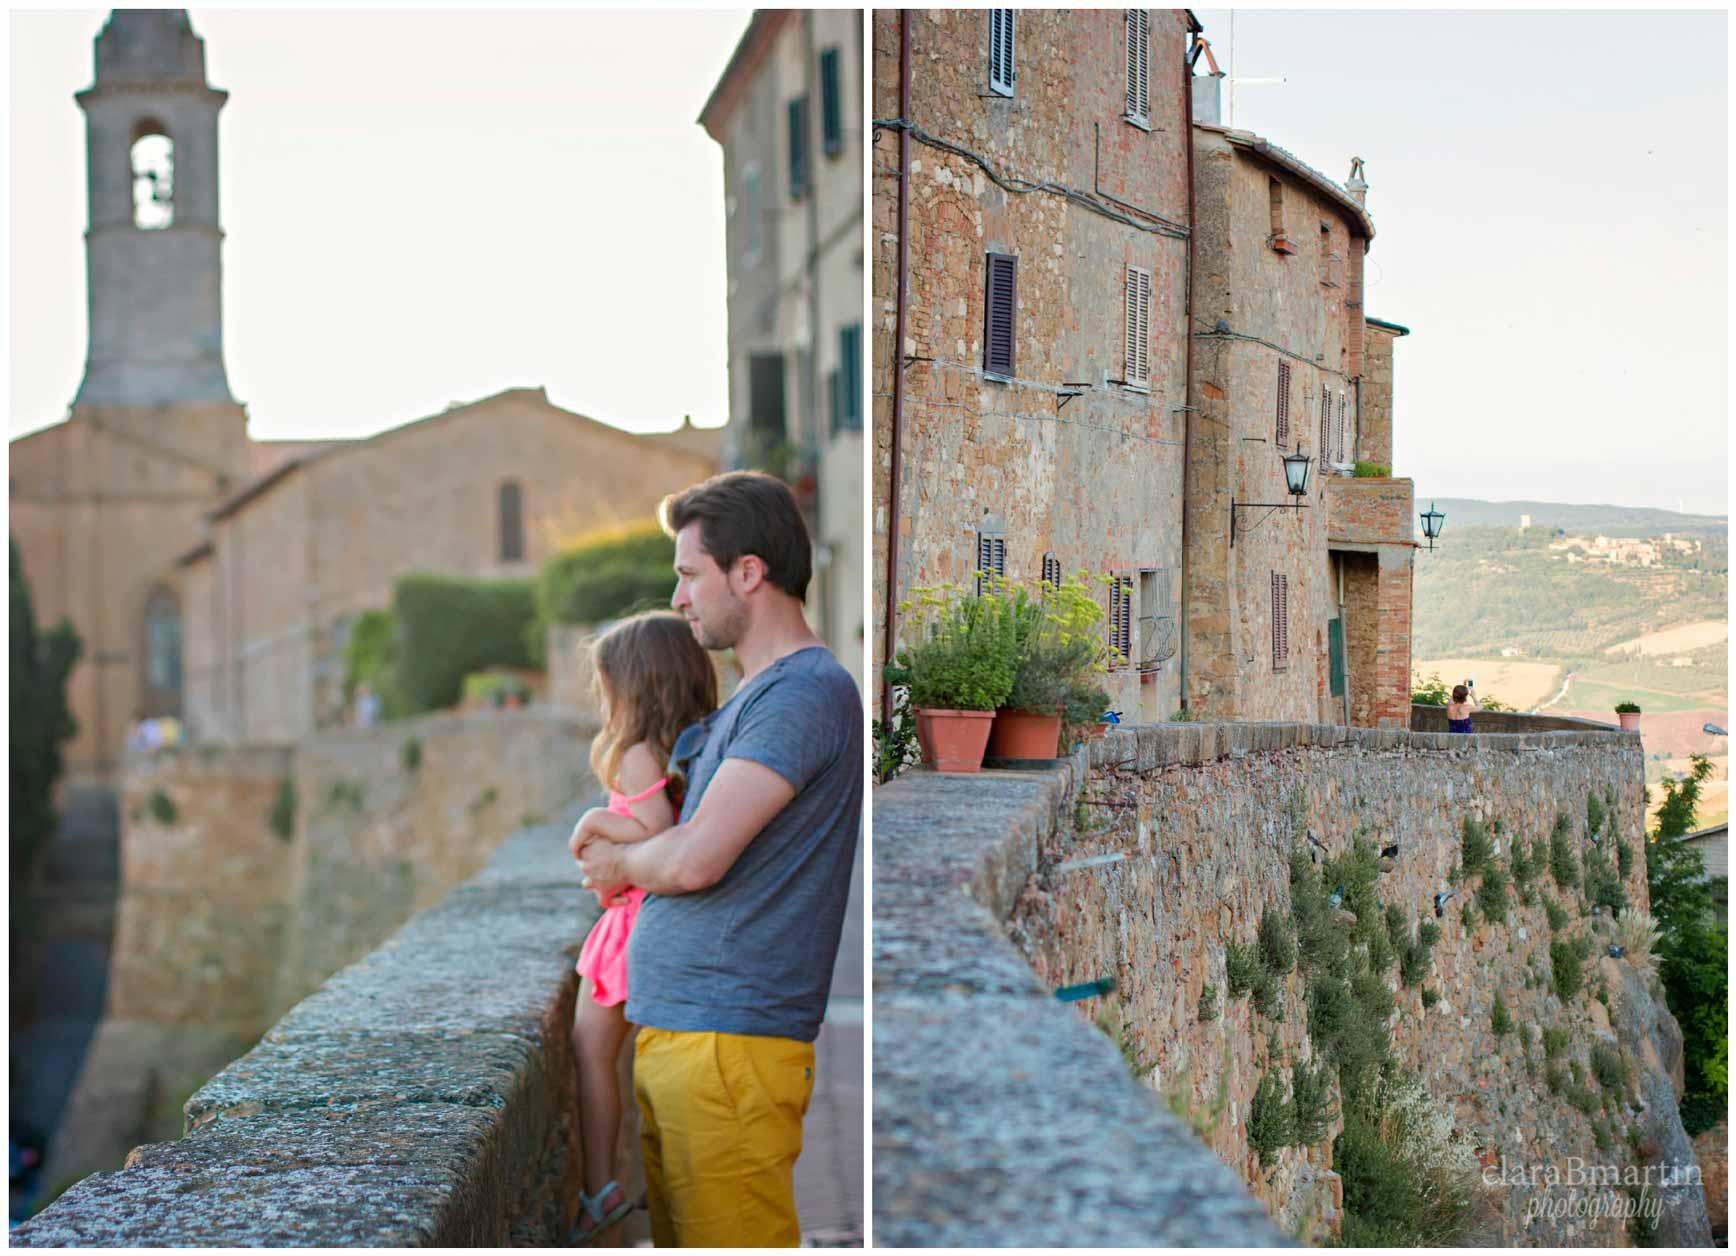 Tuscany_claraBmartin4Collage